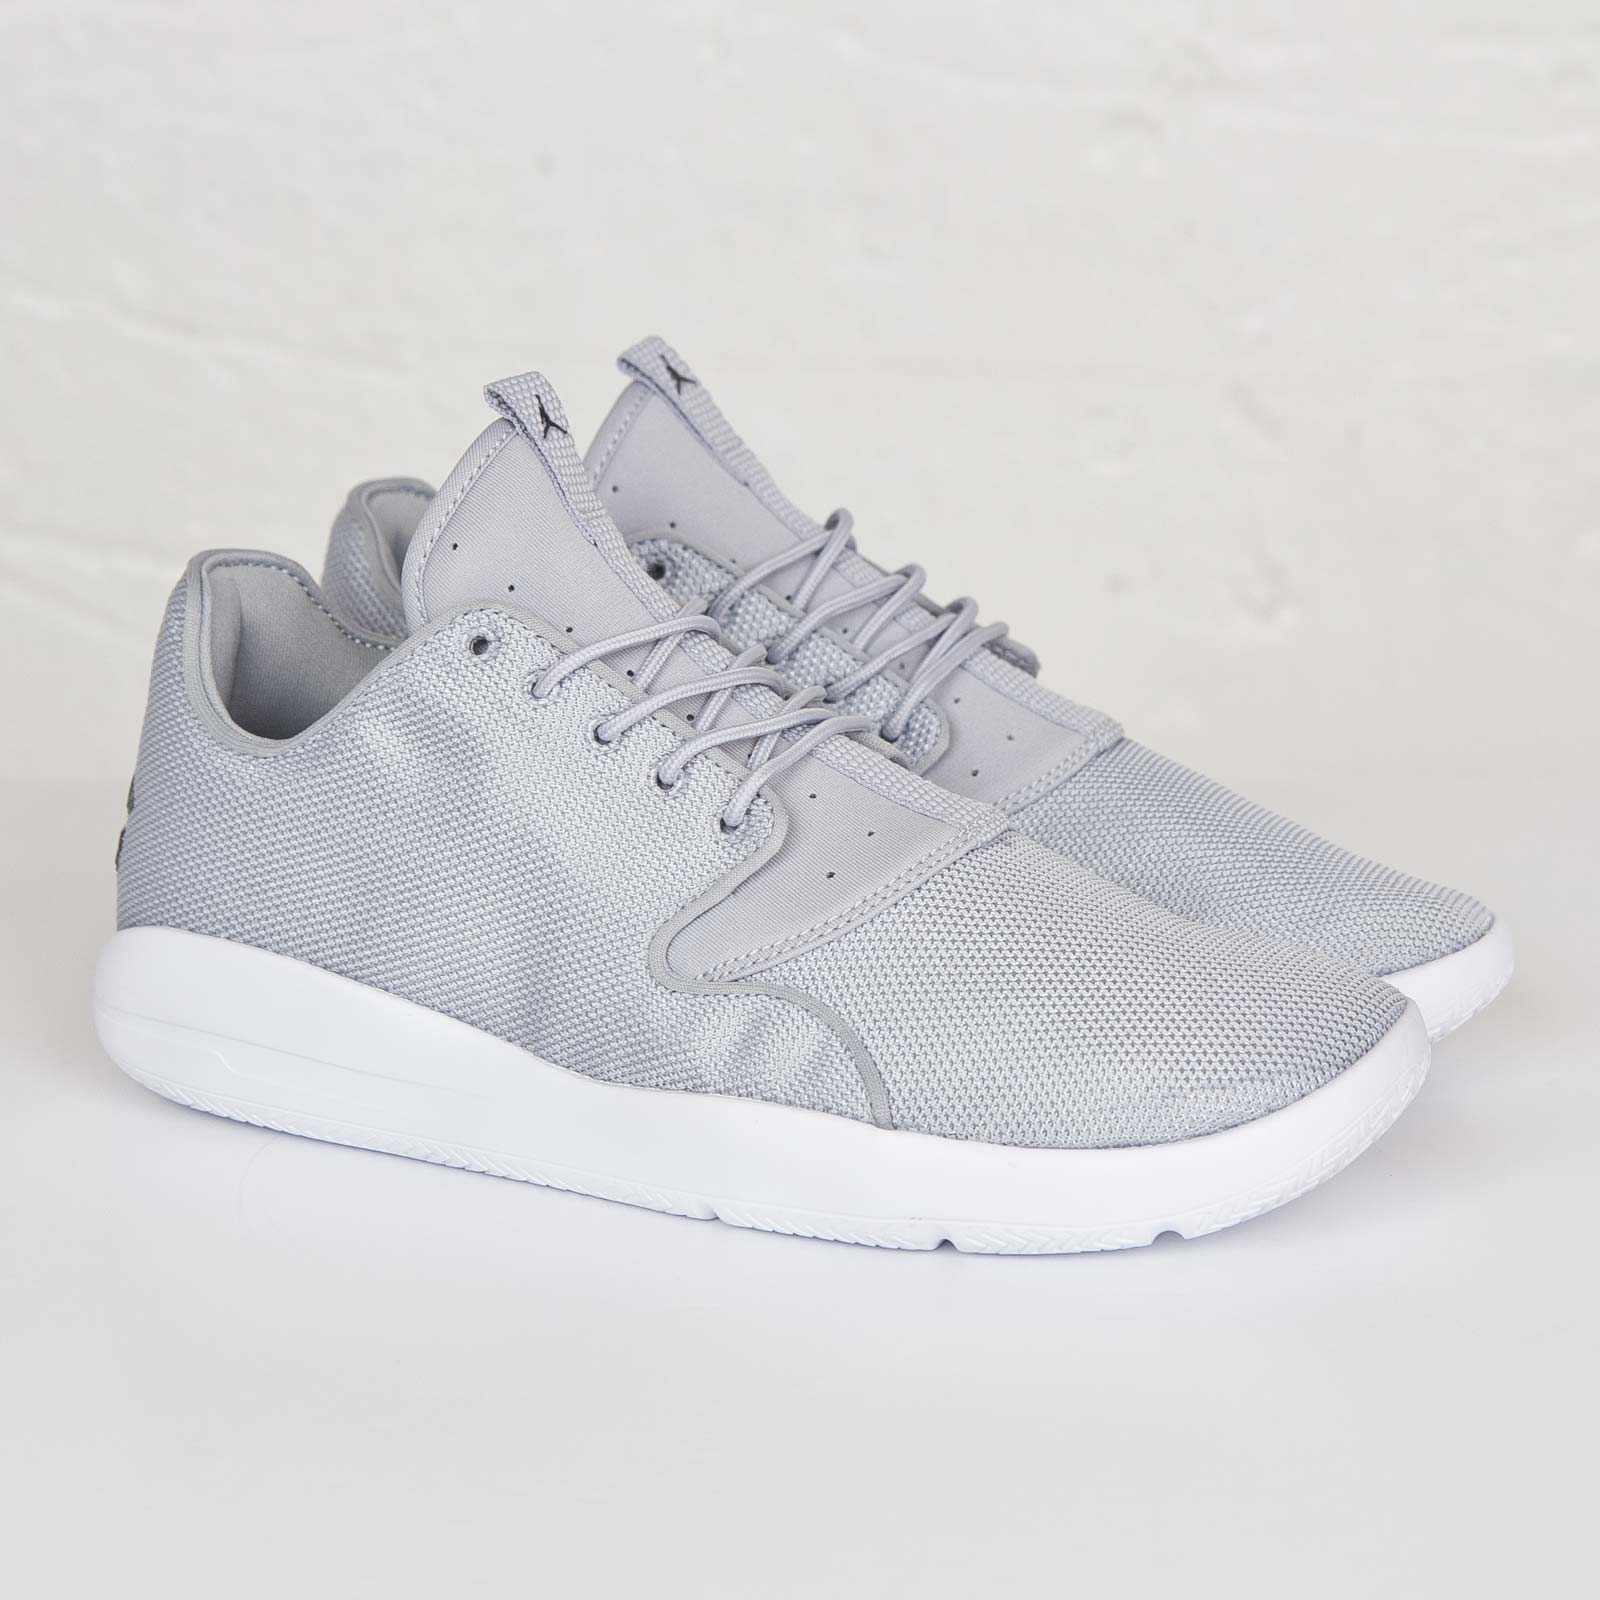 94d40b140d3dc2 Jordan Brand Jordan Eclipse - 724010-013 - Sneakersnstuff